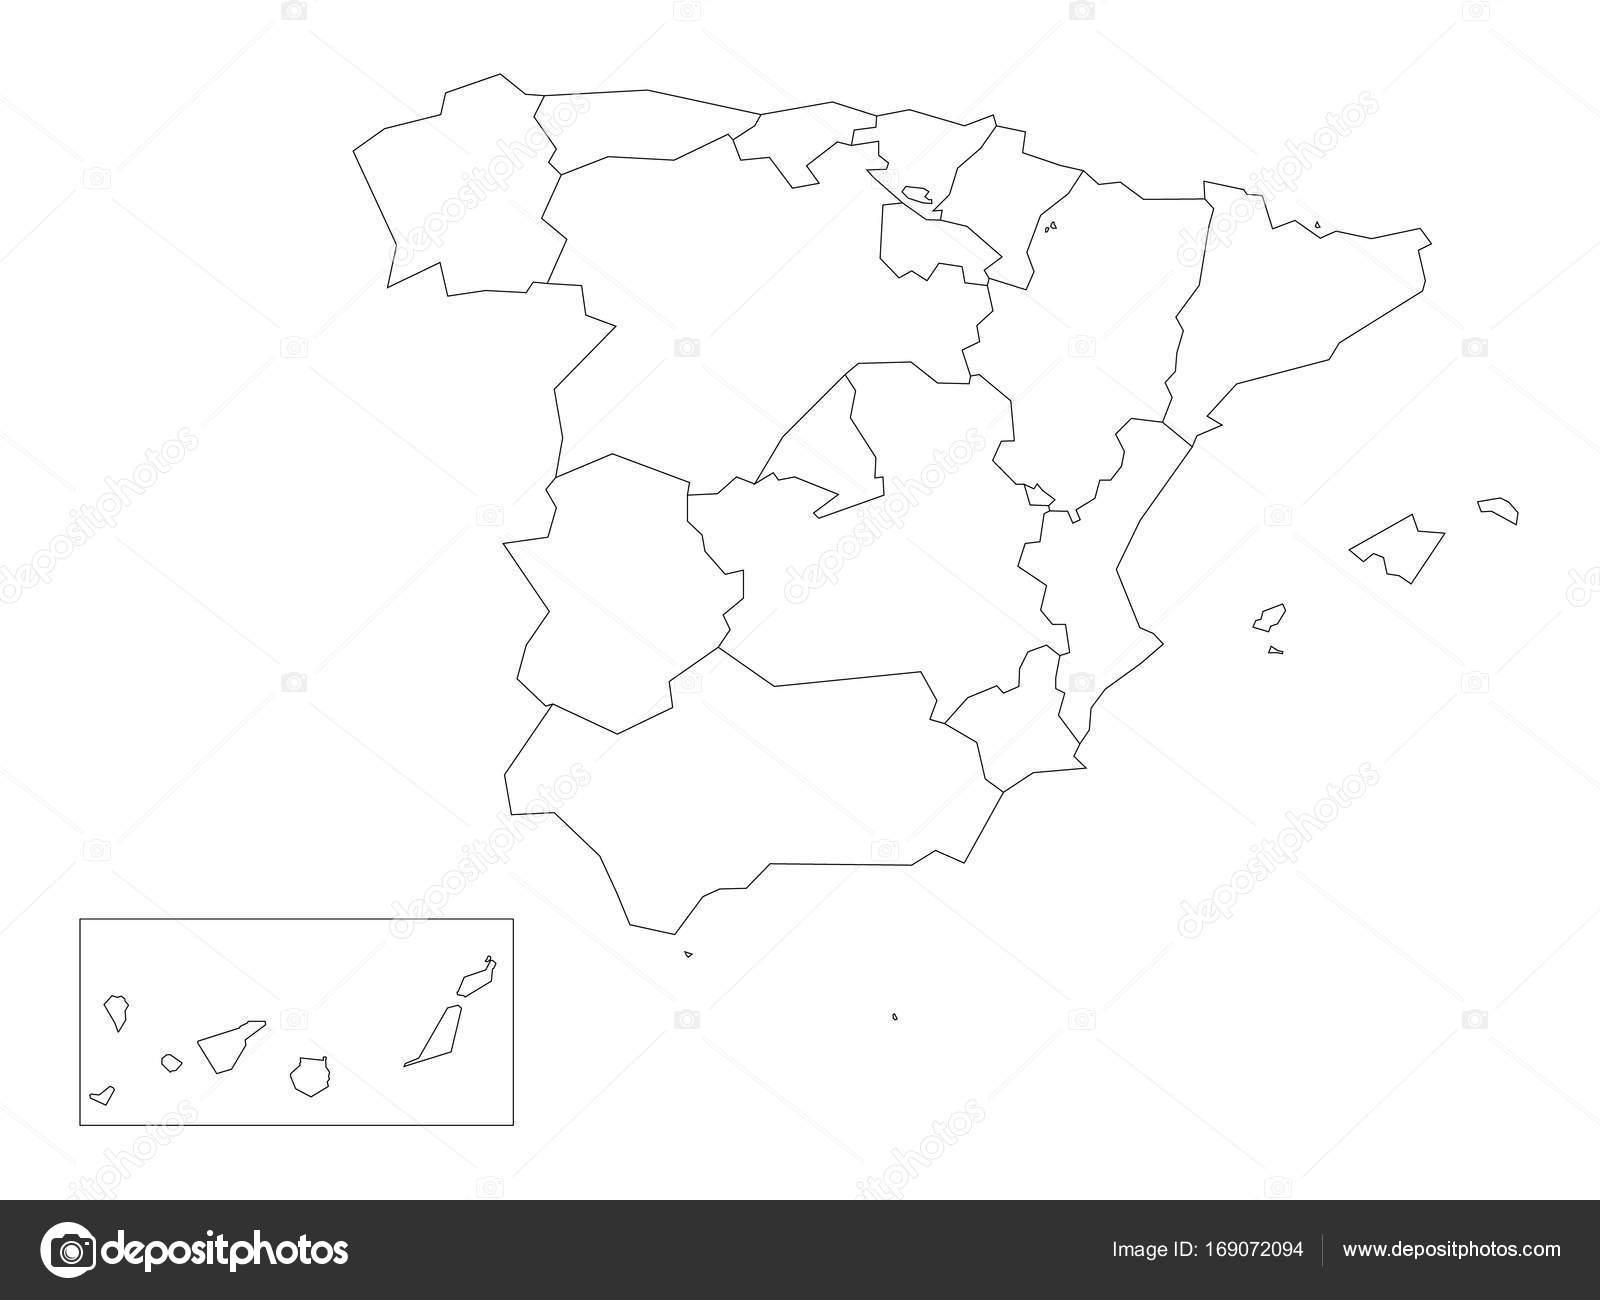 Mapa De Comunidades Autonomas En Blanco.Mapa De Espana Dividido En 17 Comunidades Autonomas